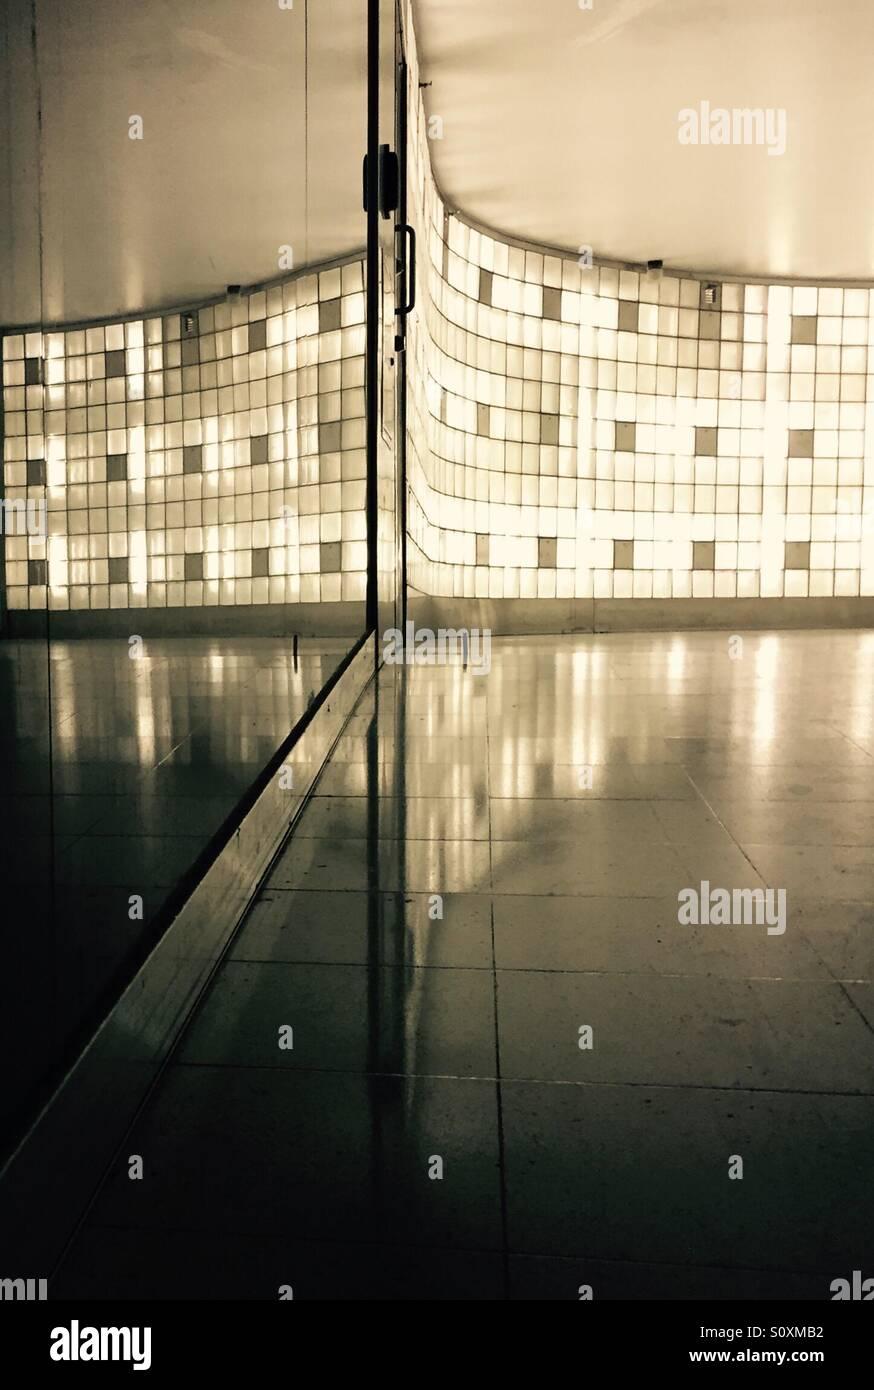 Reflection of a glass wall at University of Helsinki metro station, Finland - Stock Image